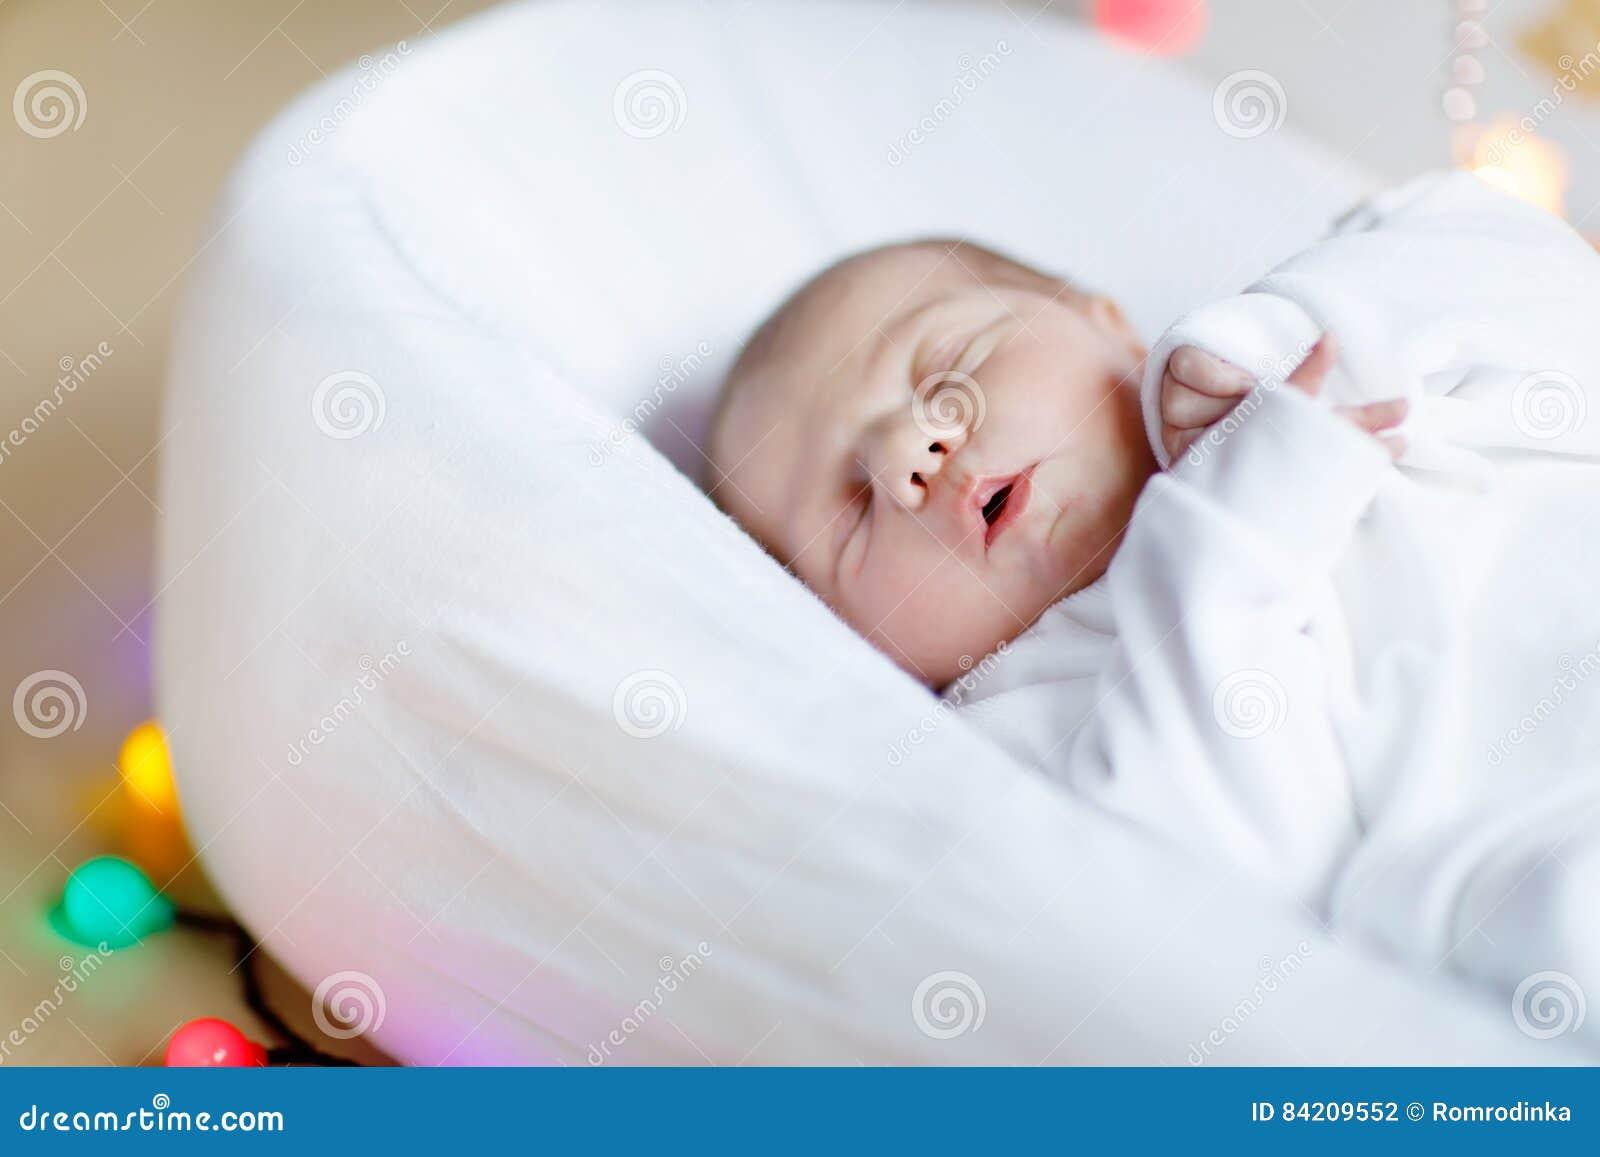 32270472e4b7 Portrait Of Cute Adorable Newborn Baby Girl Sleeping Stock Photo ...